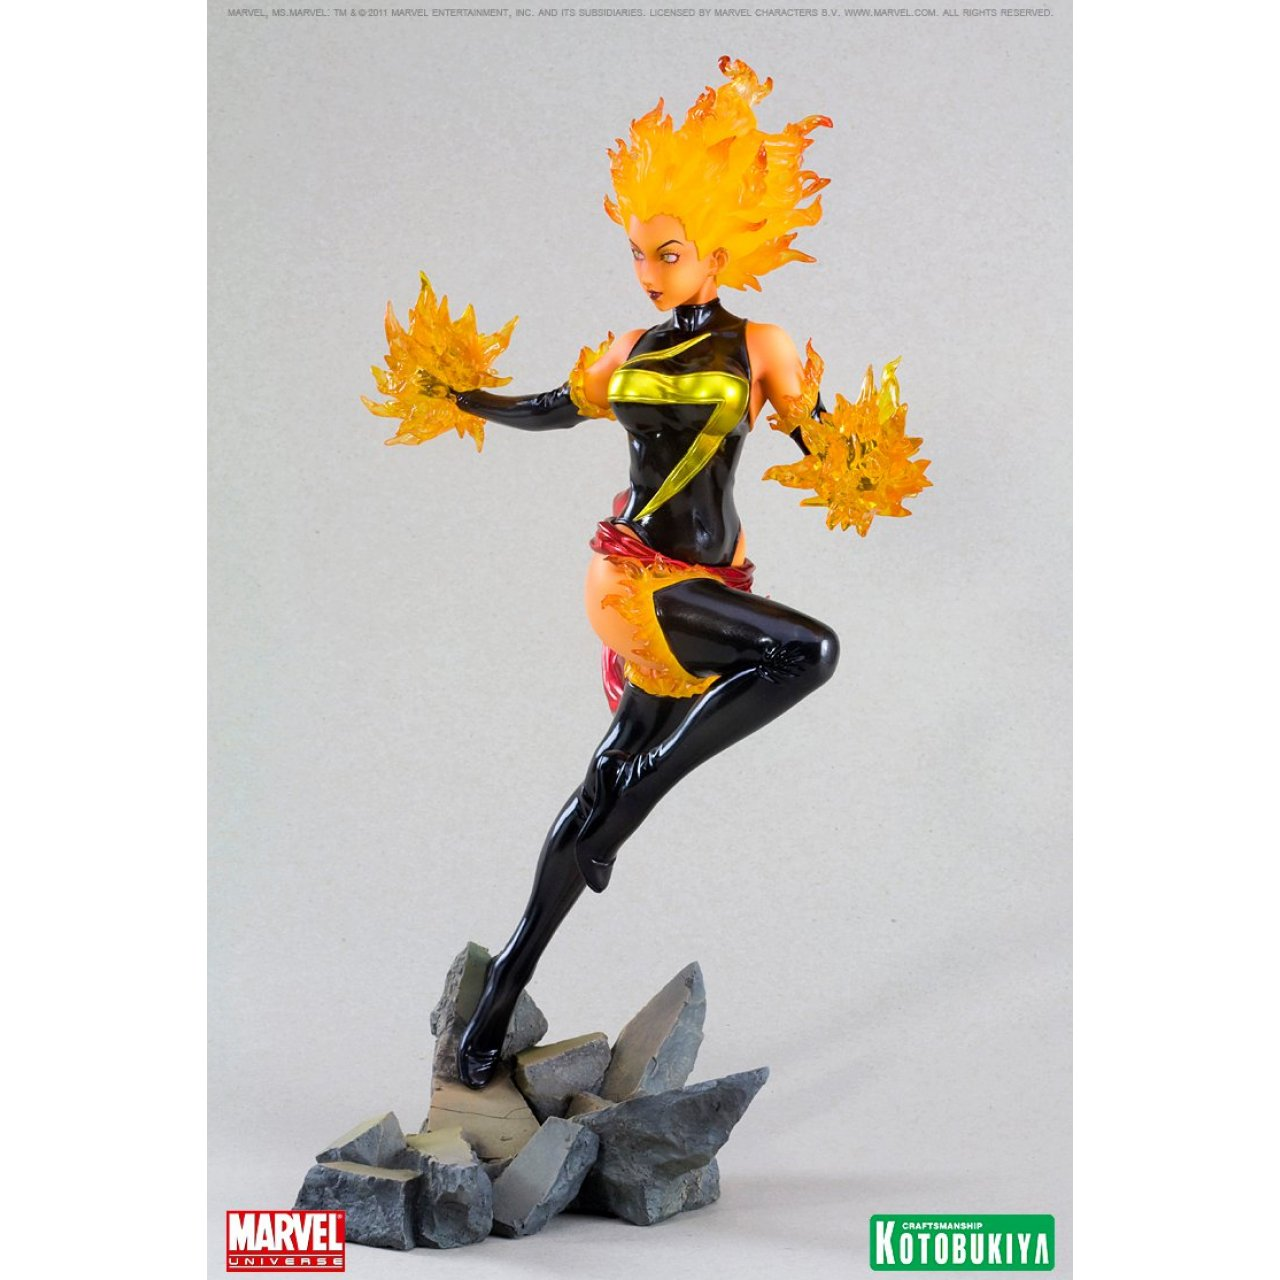 marvel-comics-ms-marvel-binary-version-bishoujo-statue-3